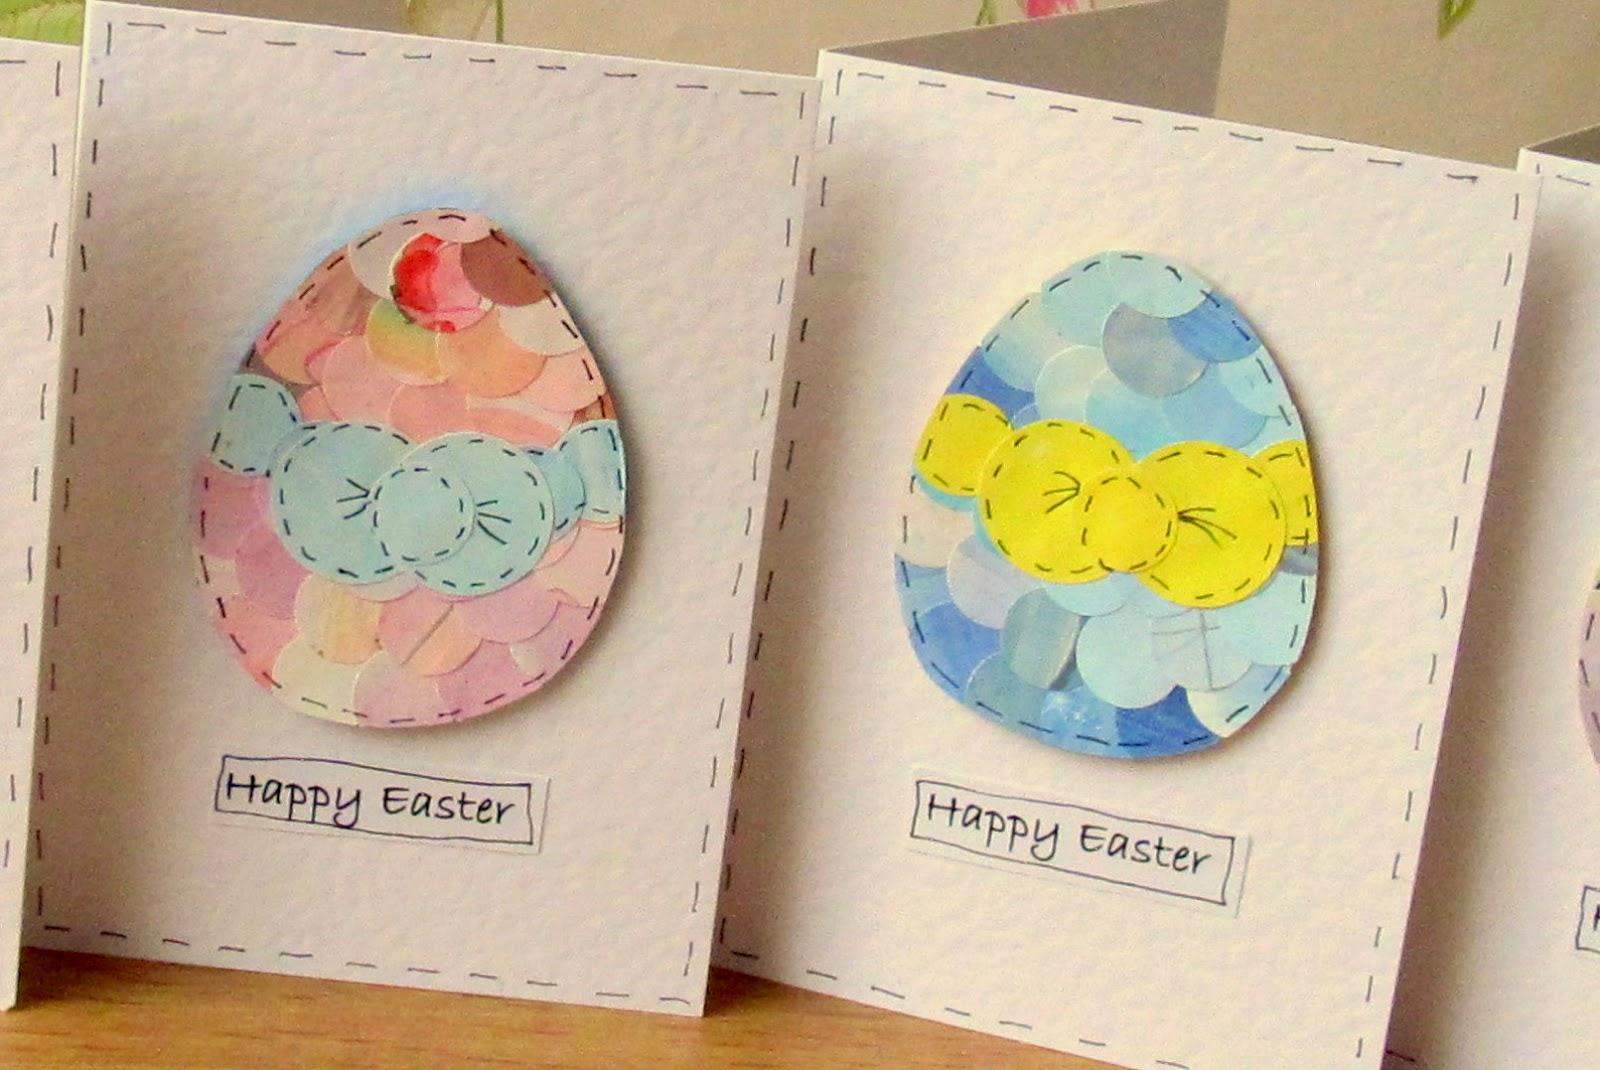 Jennuine by Rook No 17 DIY Vintage Paper Easter Egg Art Guest – Handmade Easter Cards Ideas